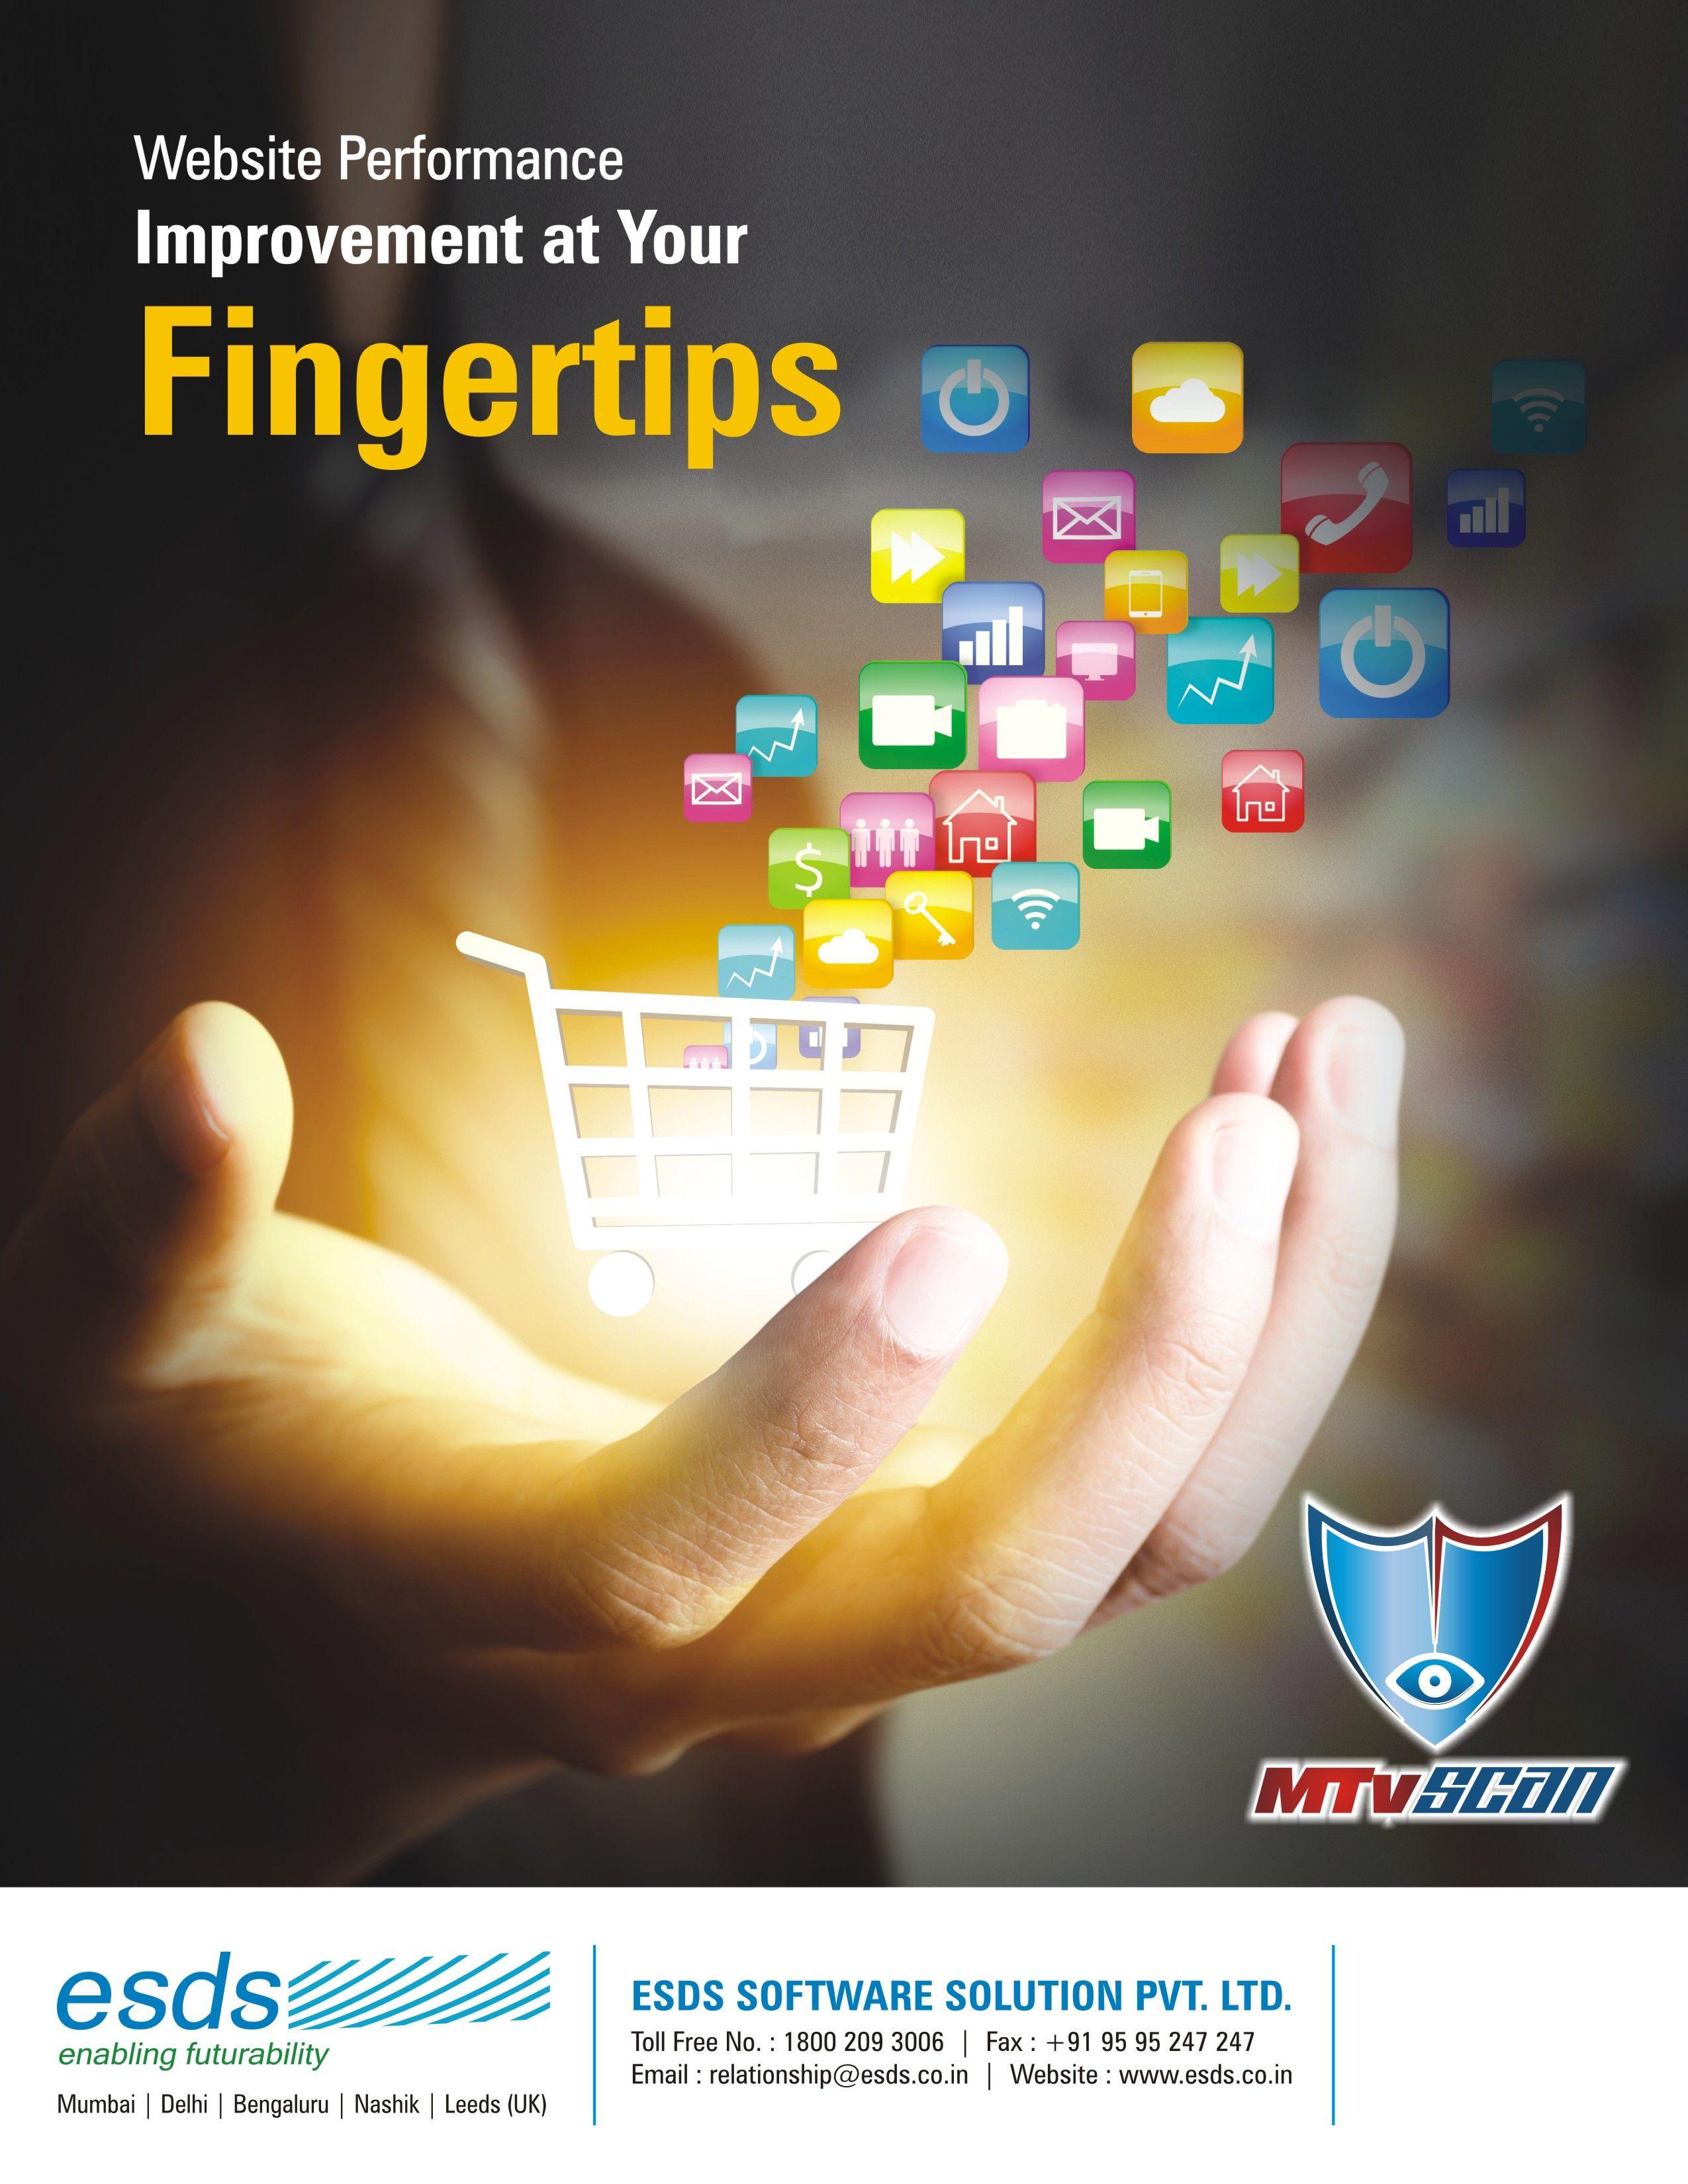 Website Performance improvement at your Fingertips